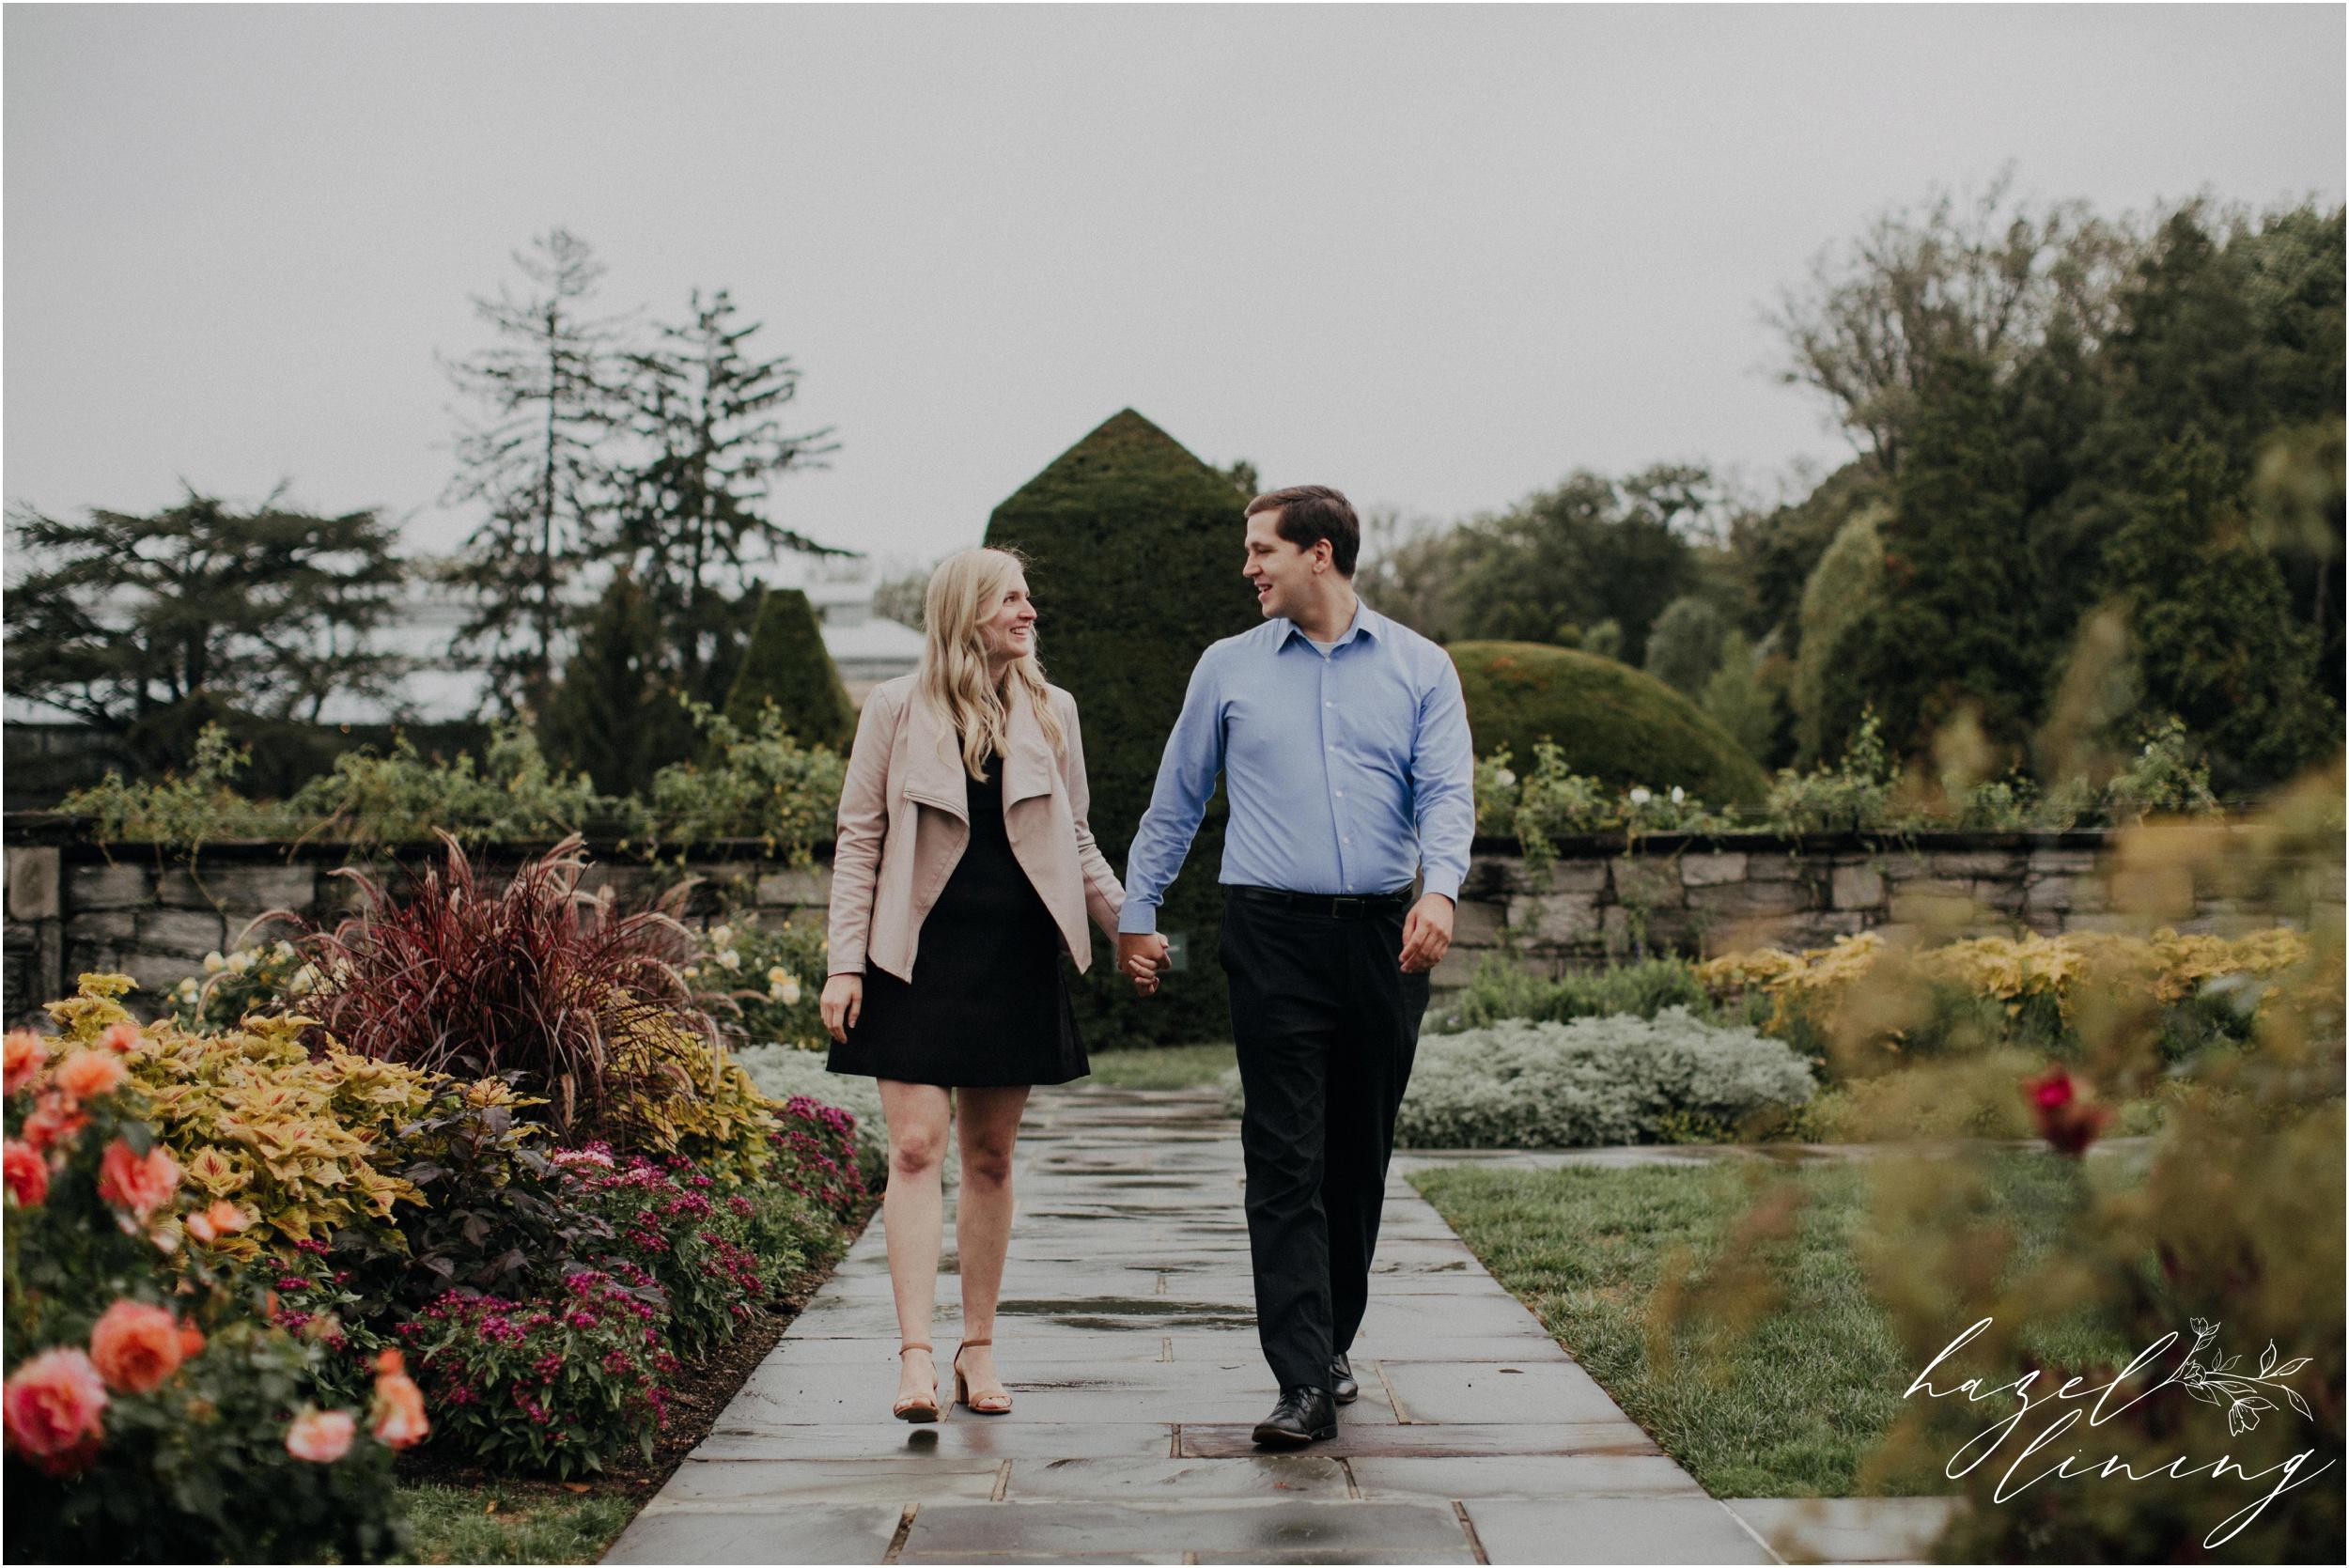 victoria-travis-logan-mayes-longwood-gardens-kennett-square-philadelphia-engagement-session-hazel-lining-photography-destination-elopement-wedding-engagement-photography_0007.jpg